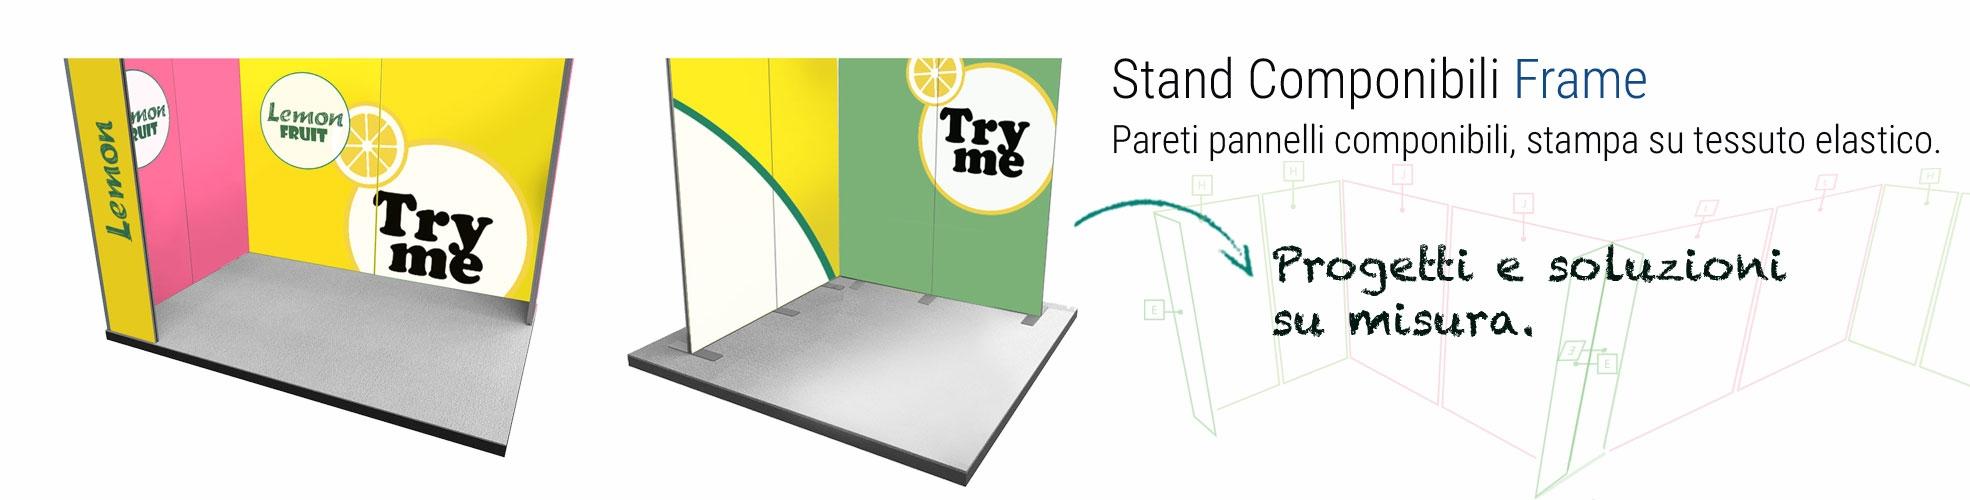 Stand modulari portatili